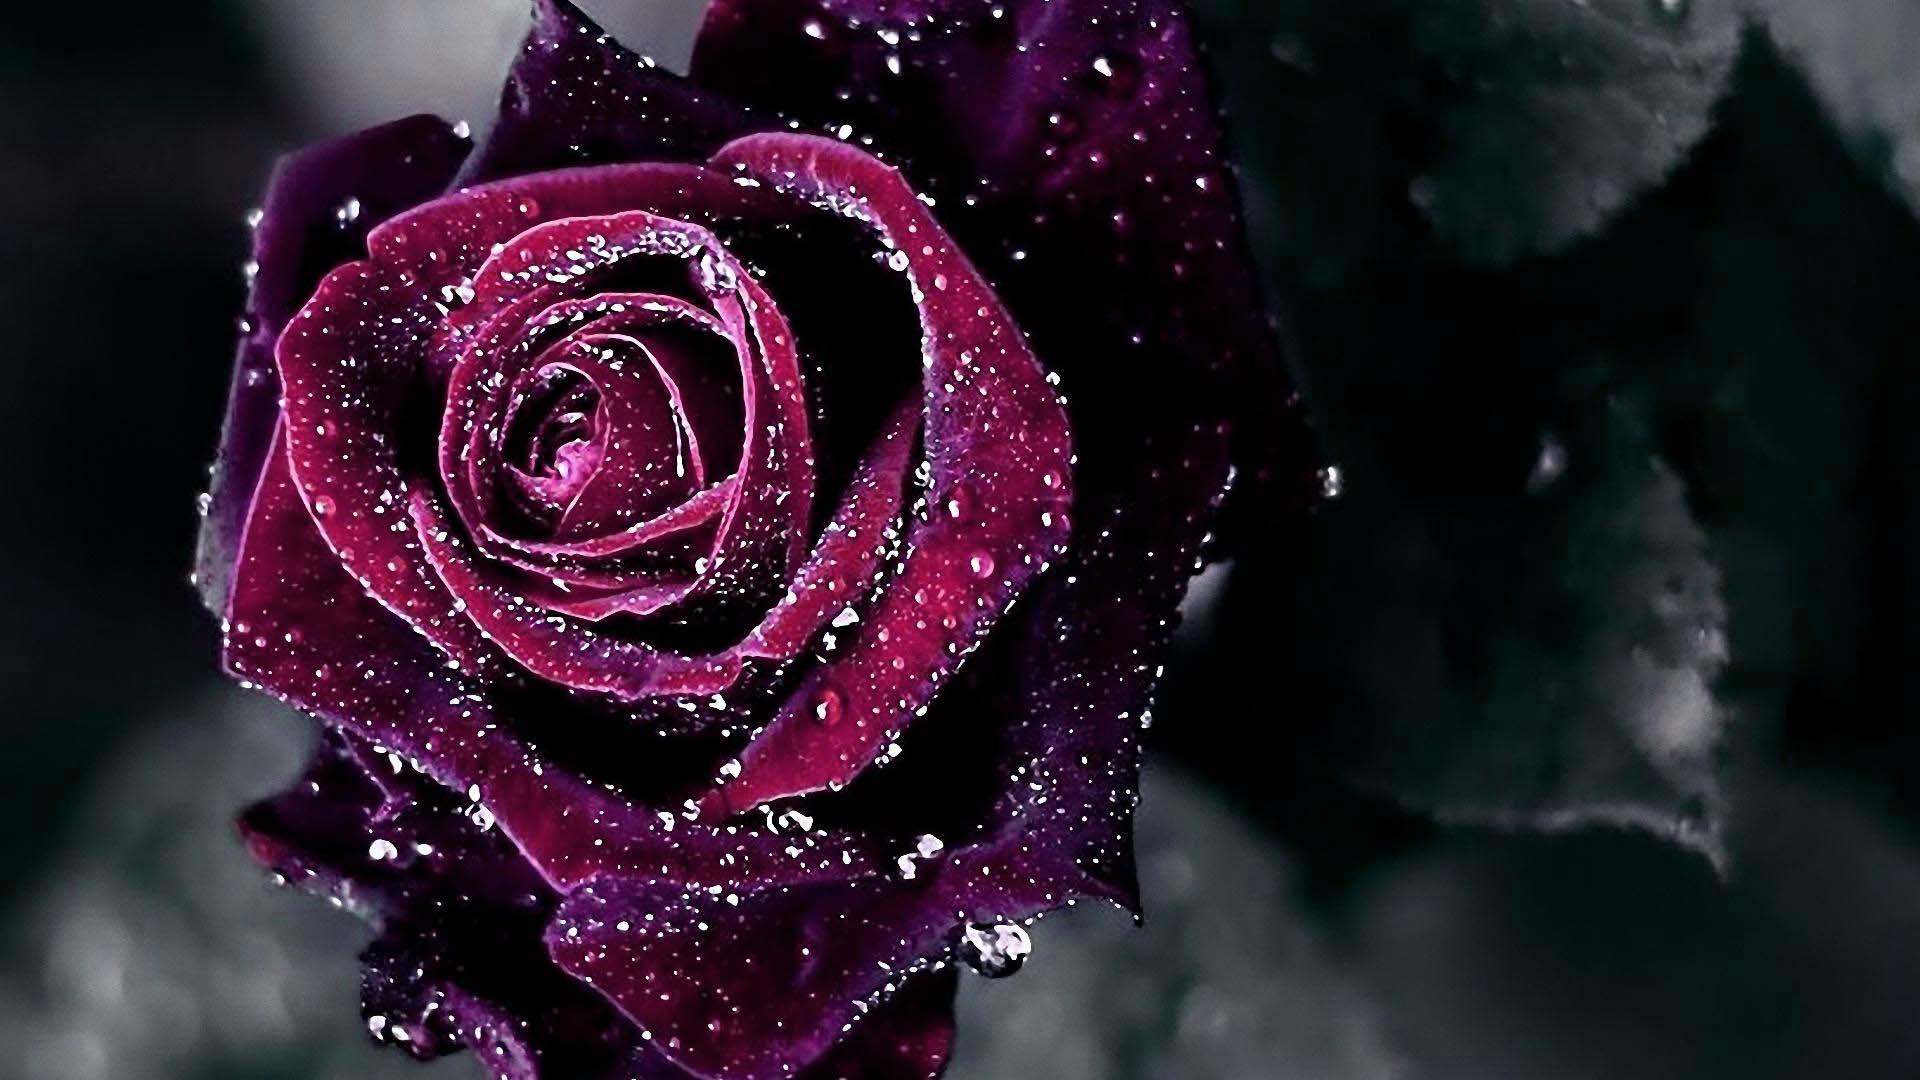 rose wallpaper hd fond ecran hd